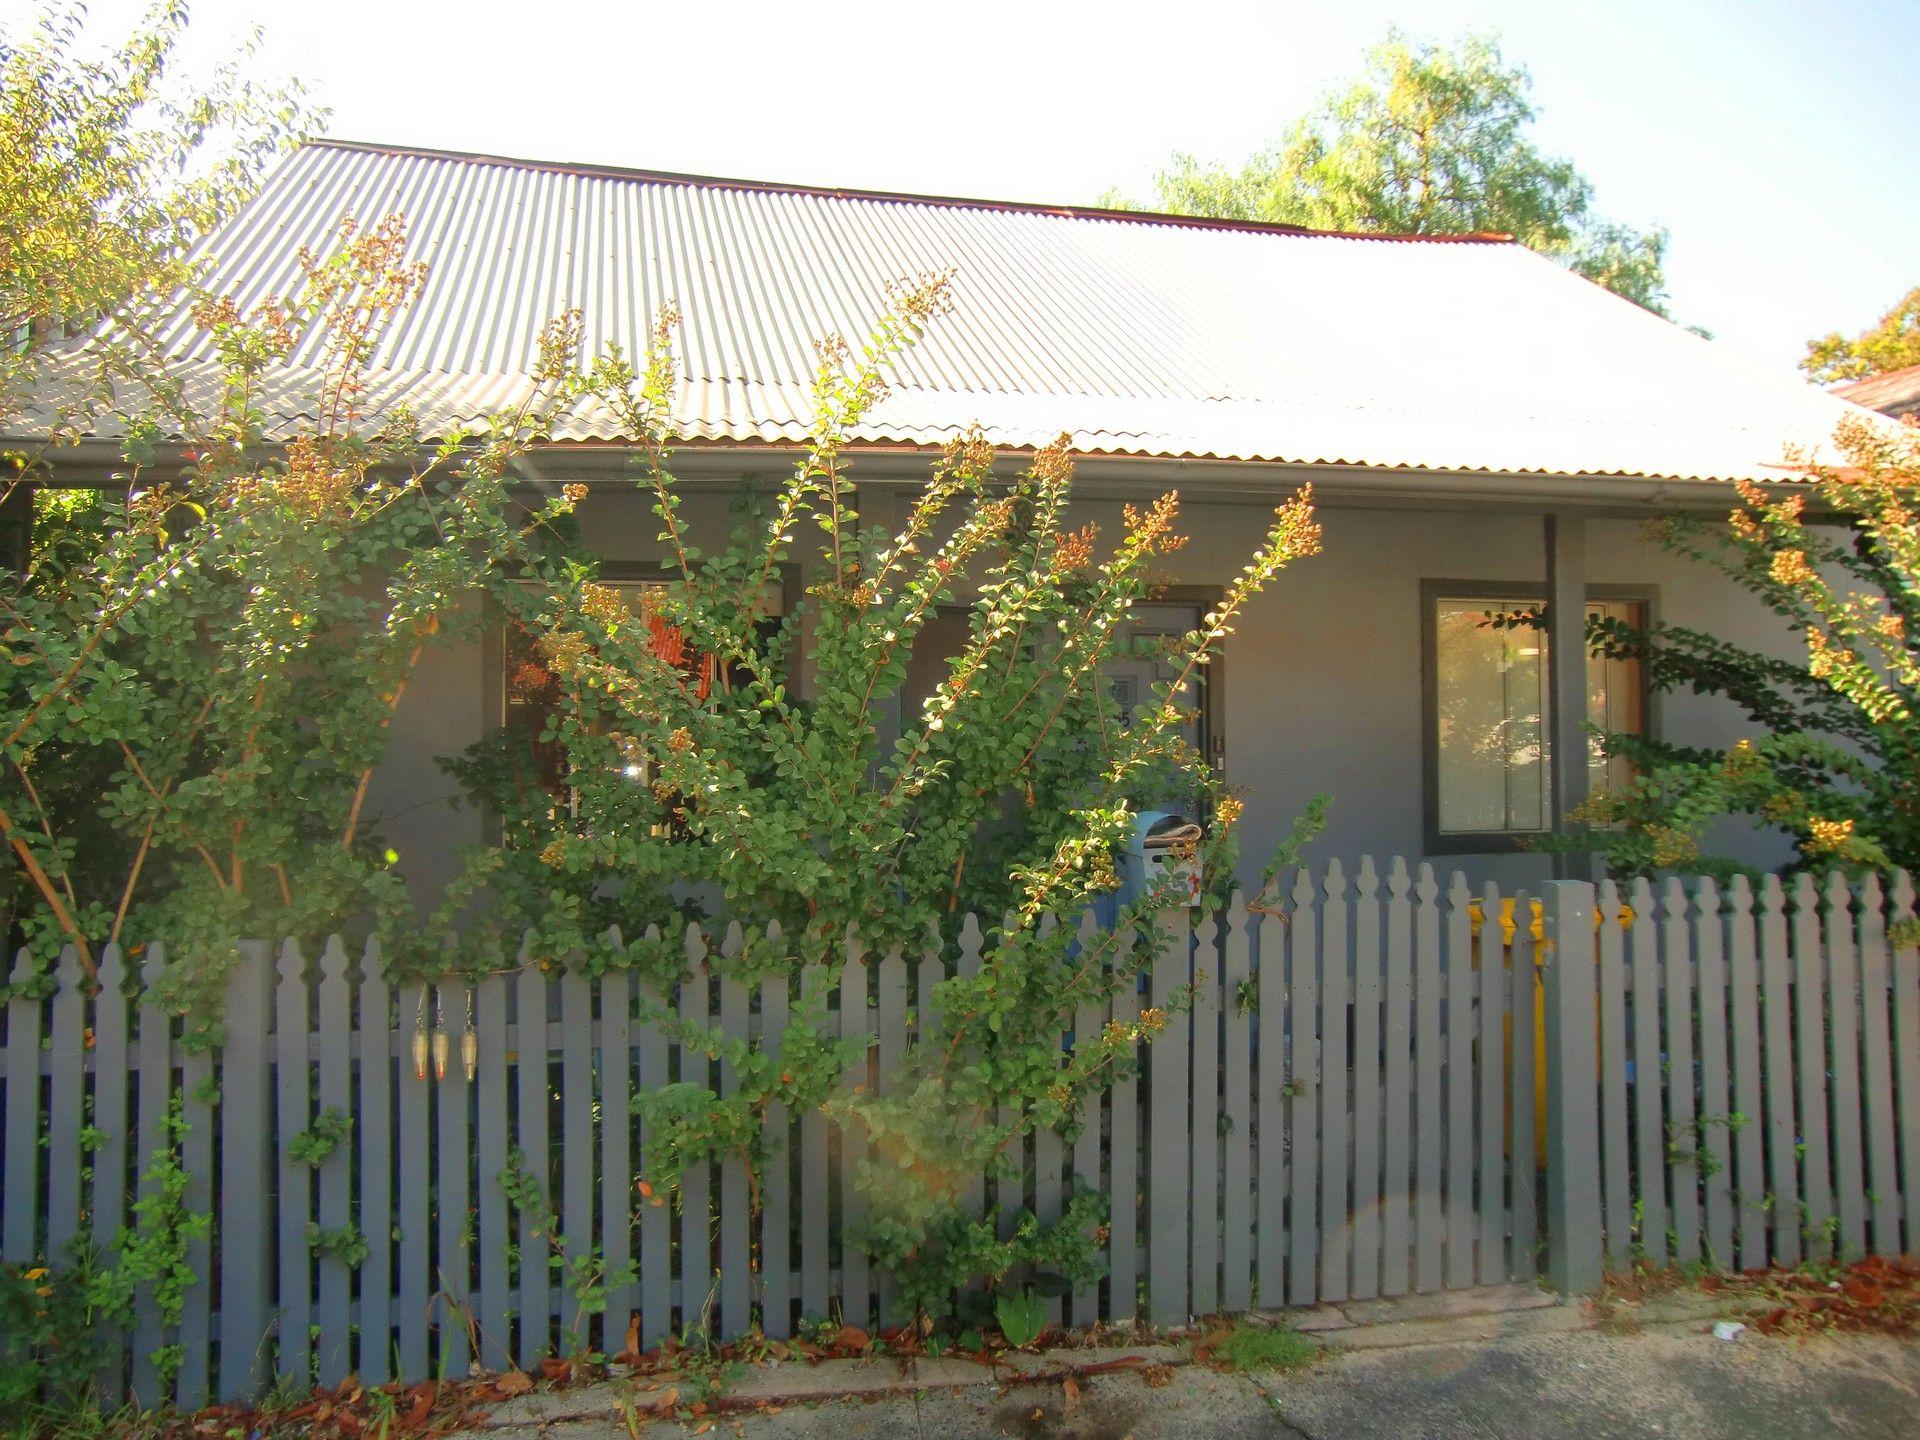 Real Estate For Lease - 55 Mackenzie Street - Leichhardt , nsw